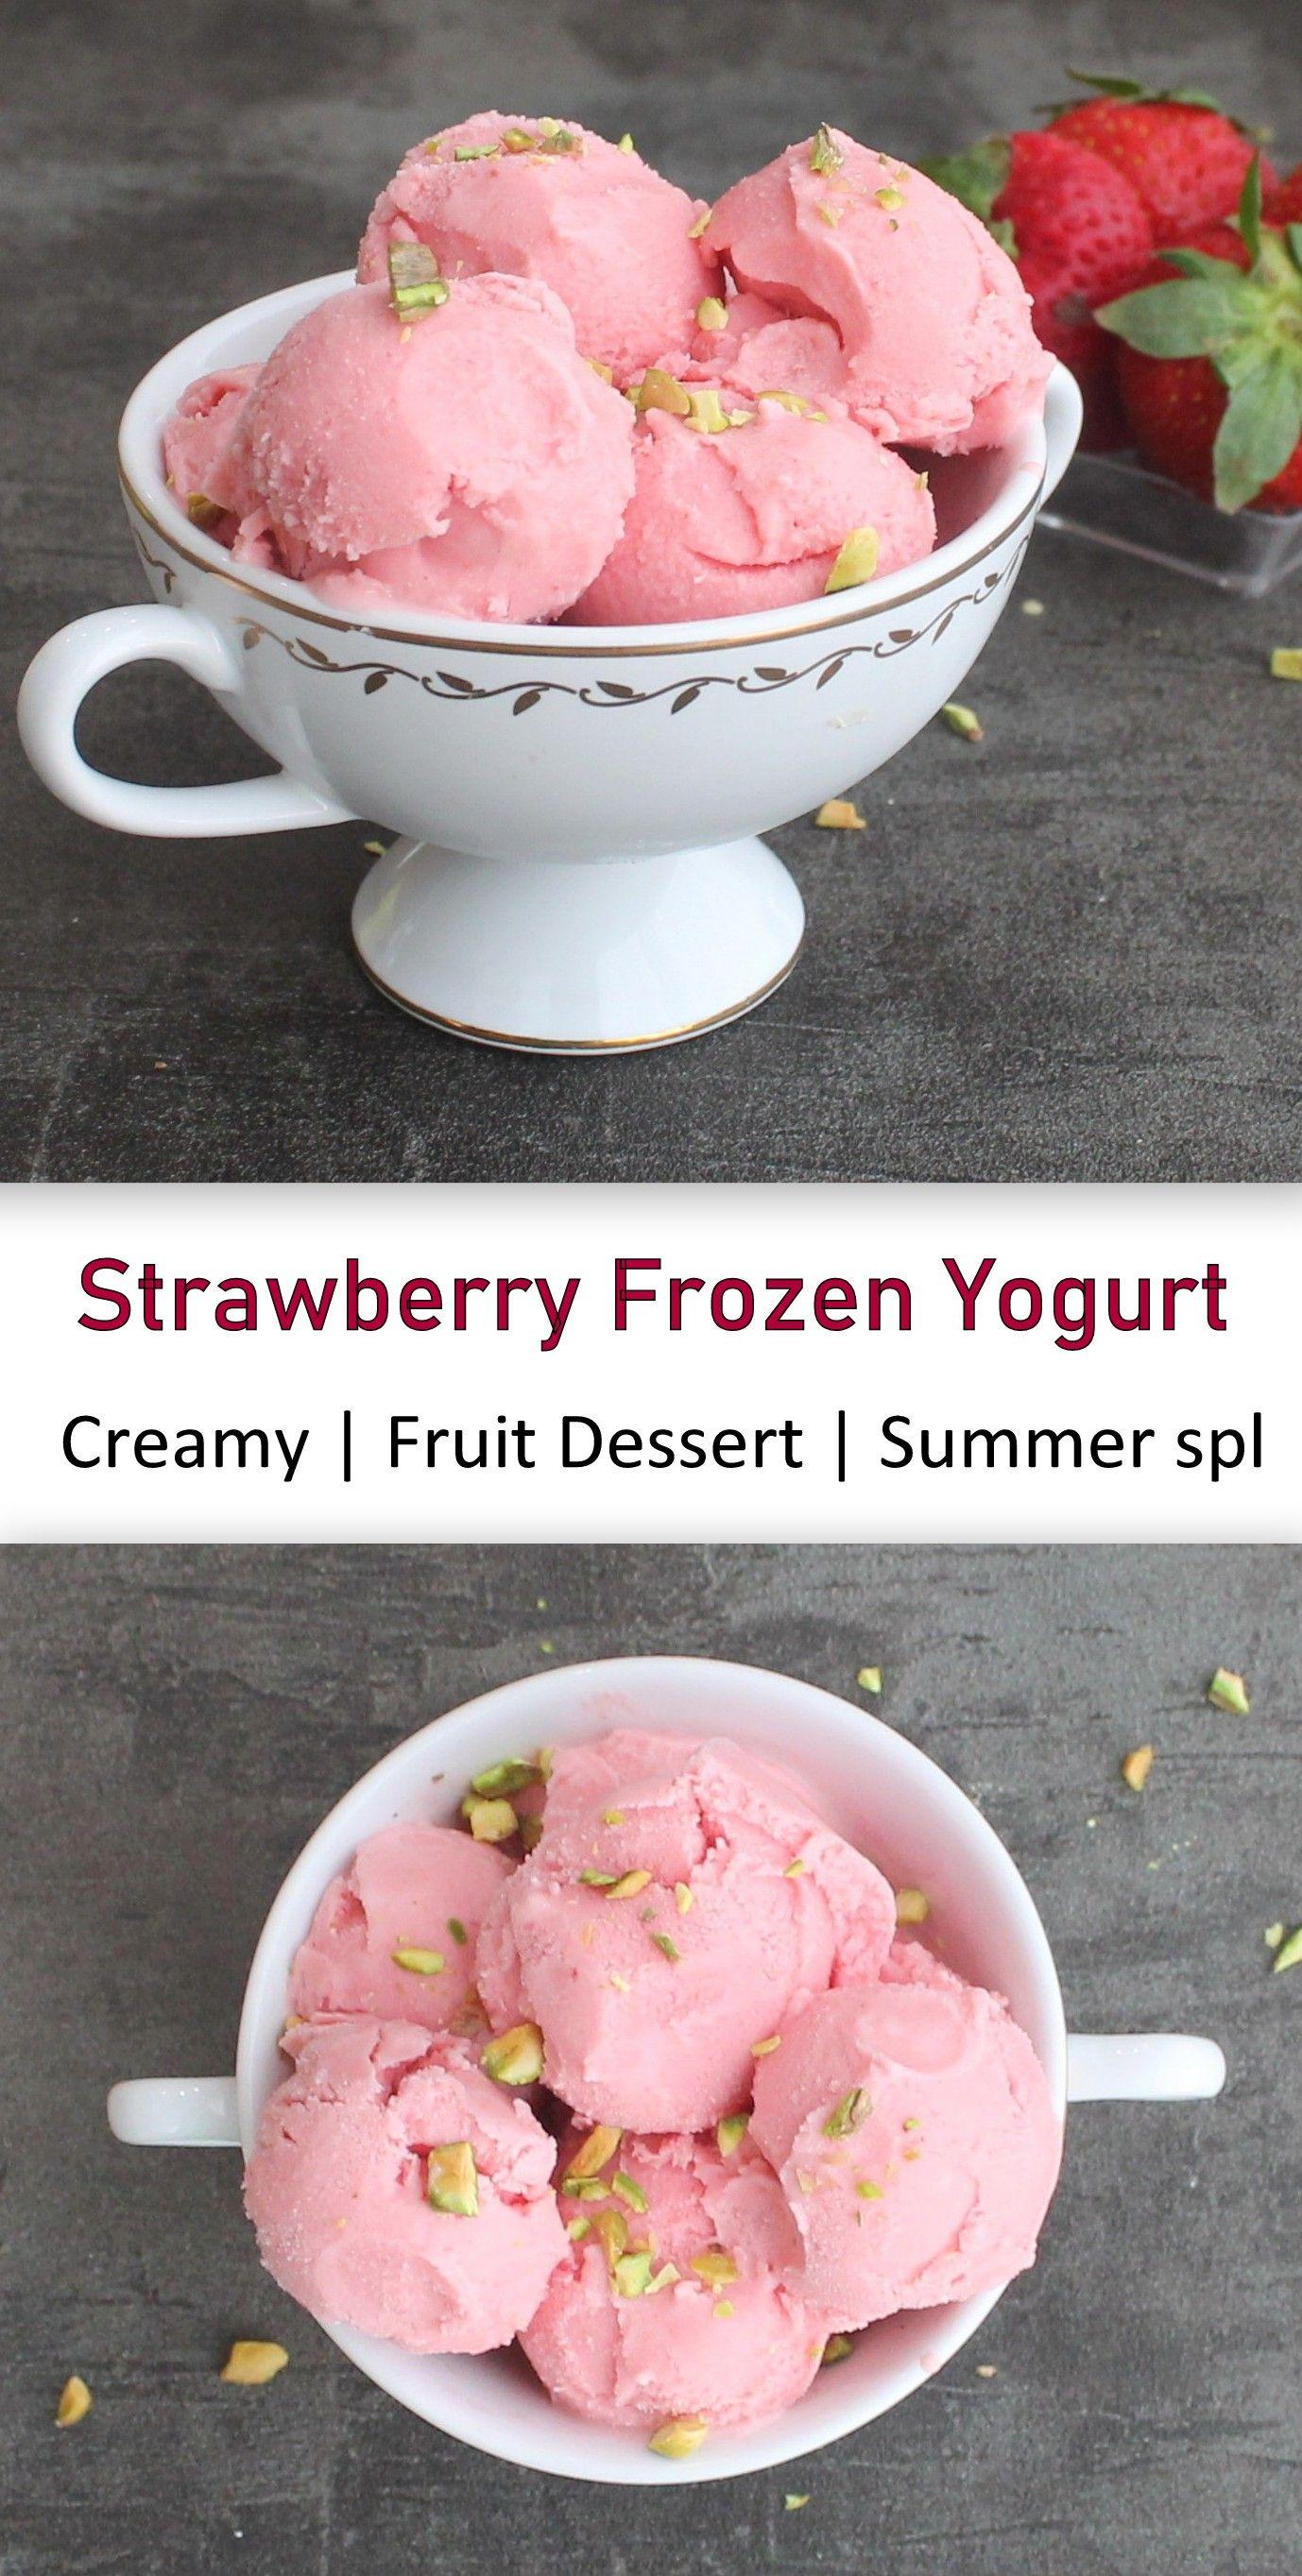 Strawberry Frozen Yogurt Recipe In 2020 Strawberry Frozen Yogurt Frozen Yogurt Frozen Yogurt Desserts